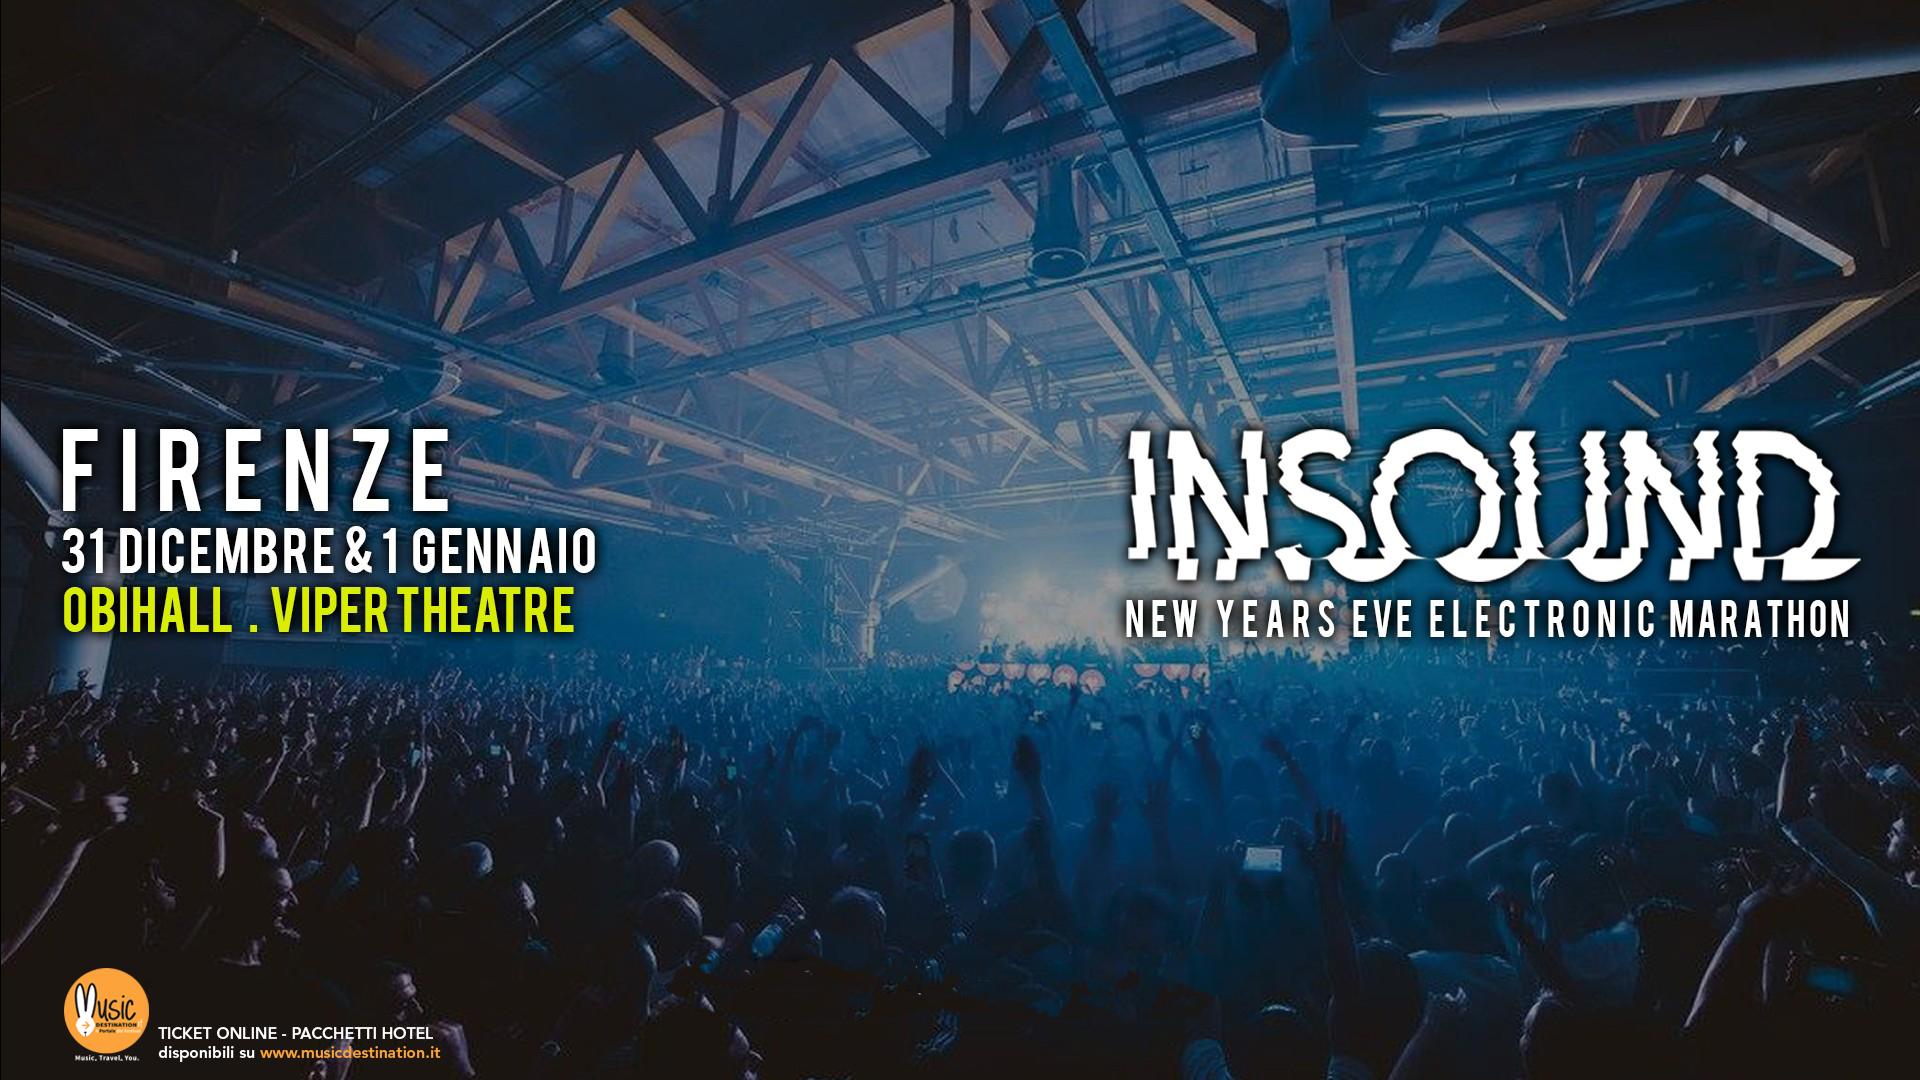 insound festival firenze 31 Dicembre 2018 01 Gennaio 2019 ticket pacchetti hotel